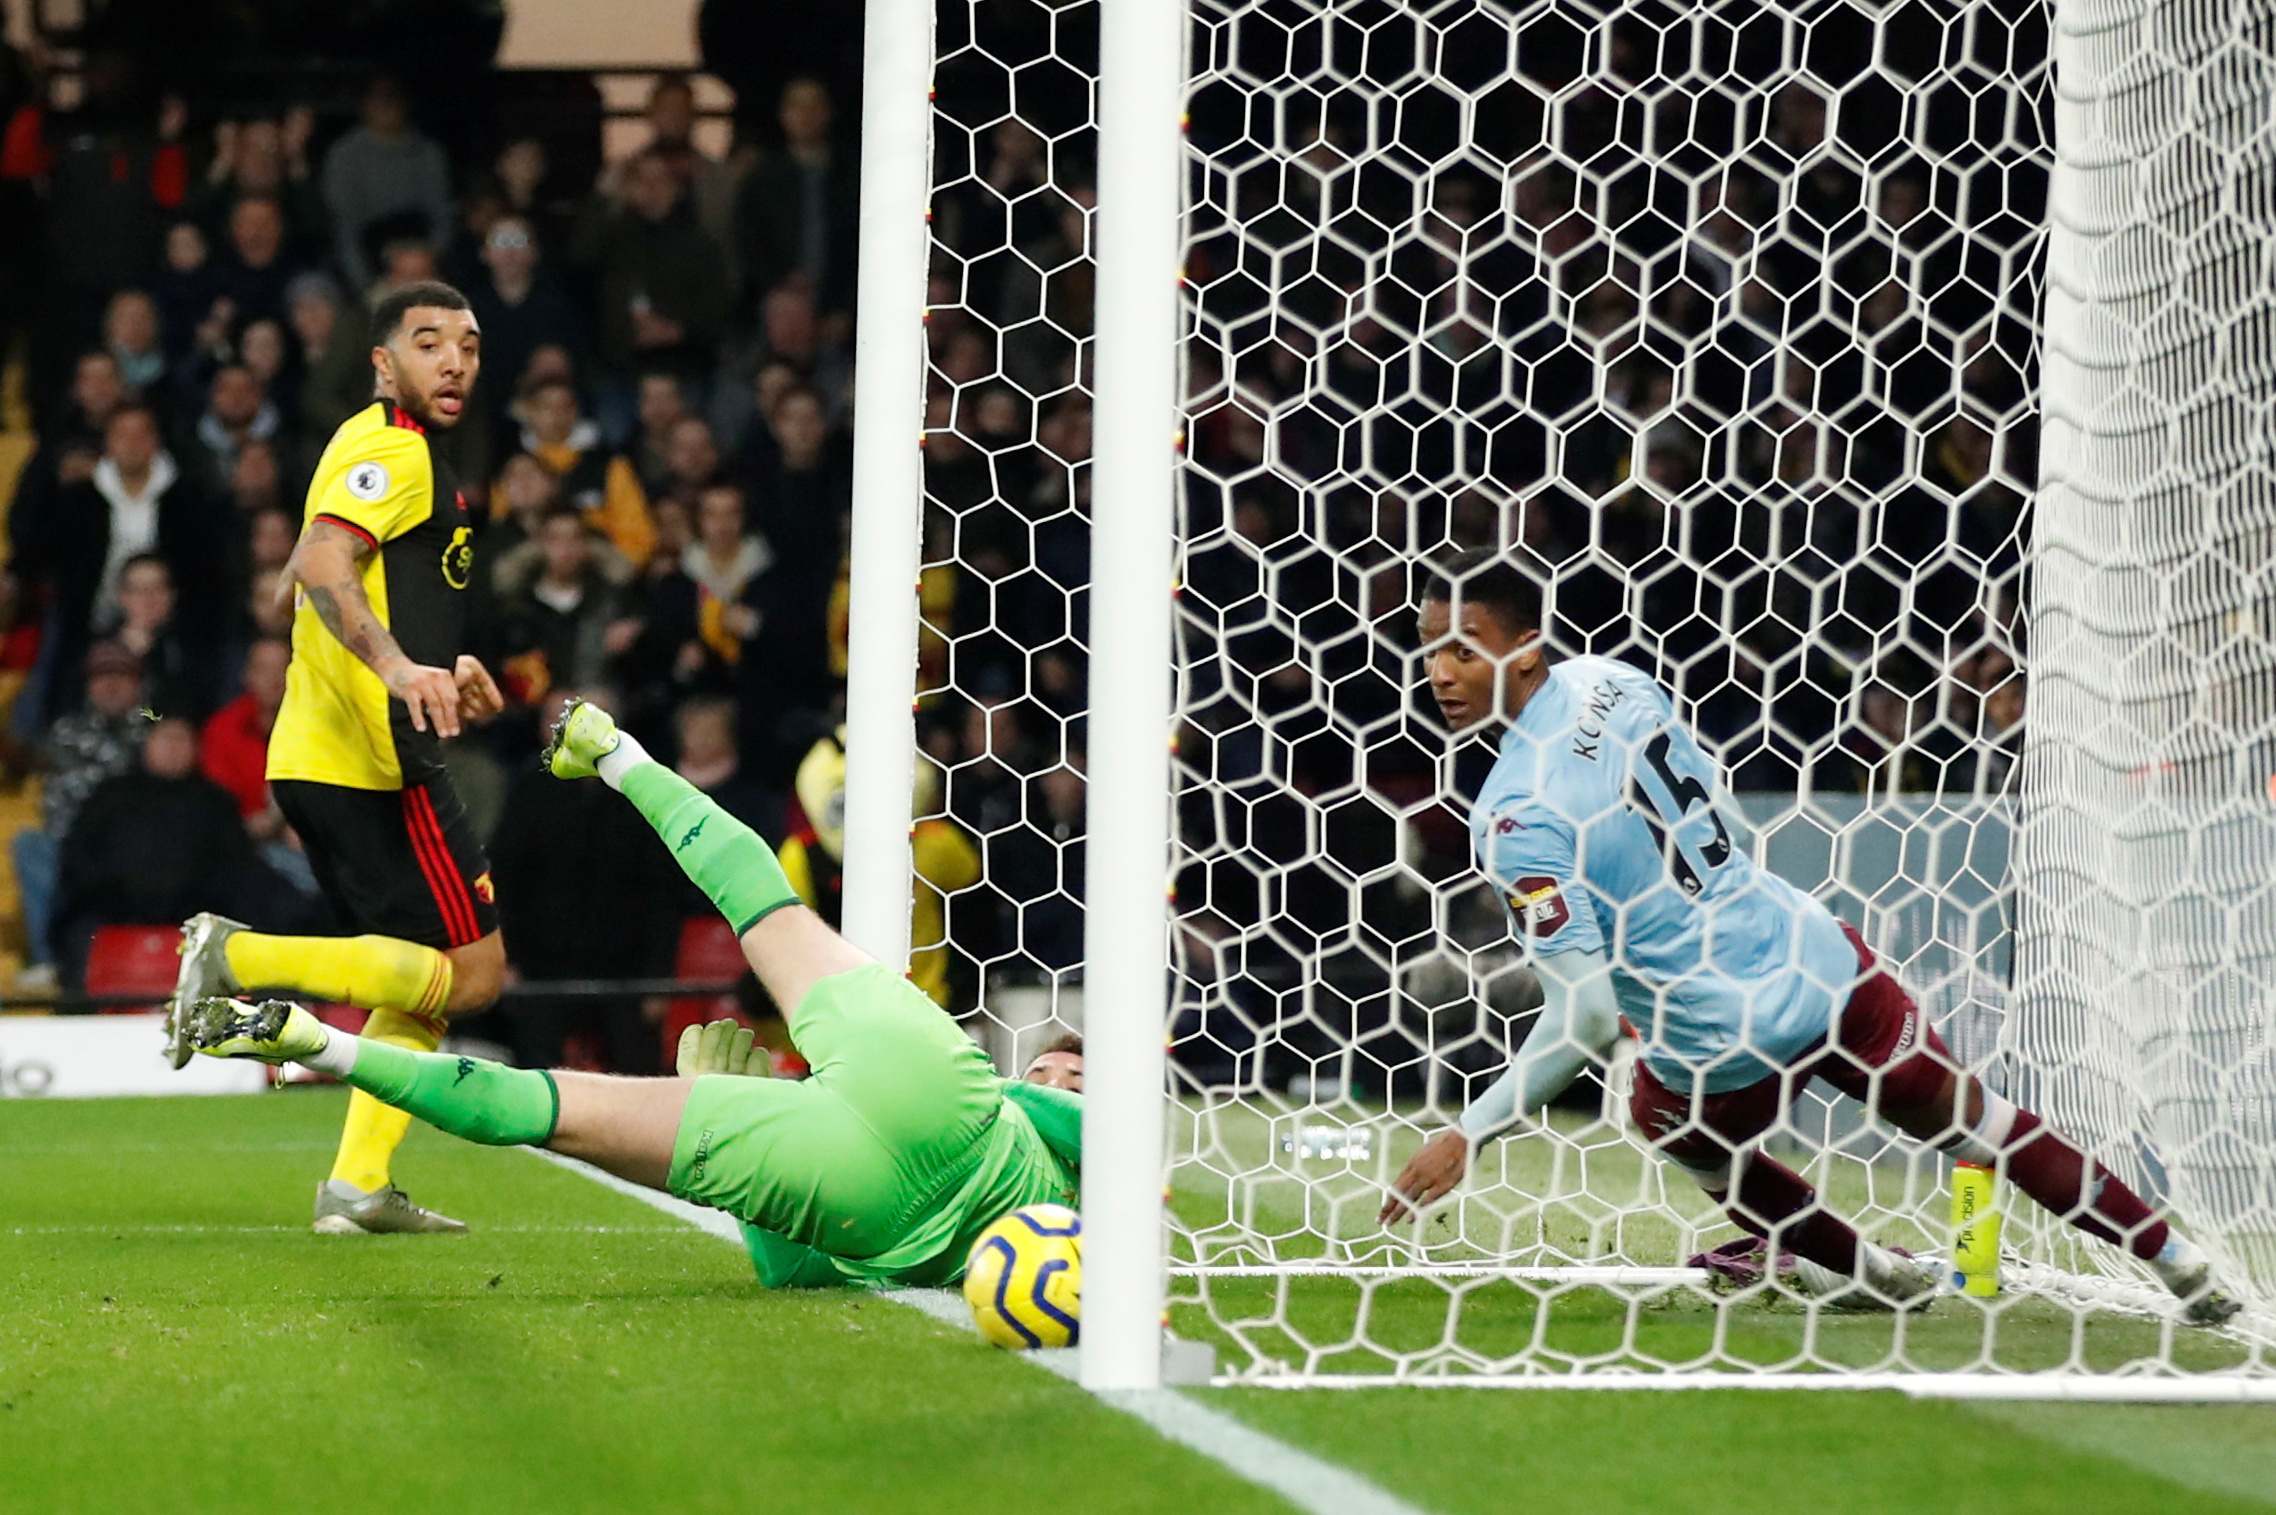 Aston Villa boss Dean Smith fears Watford captain Troy Deeney could haunt his side again